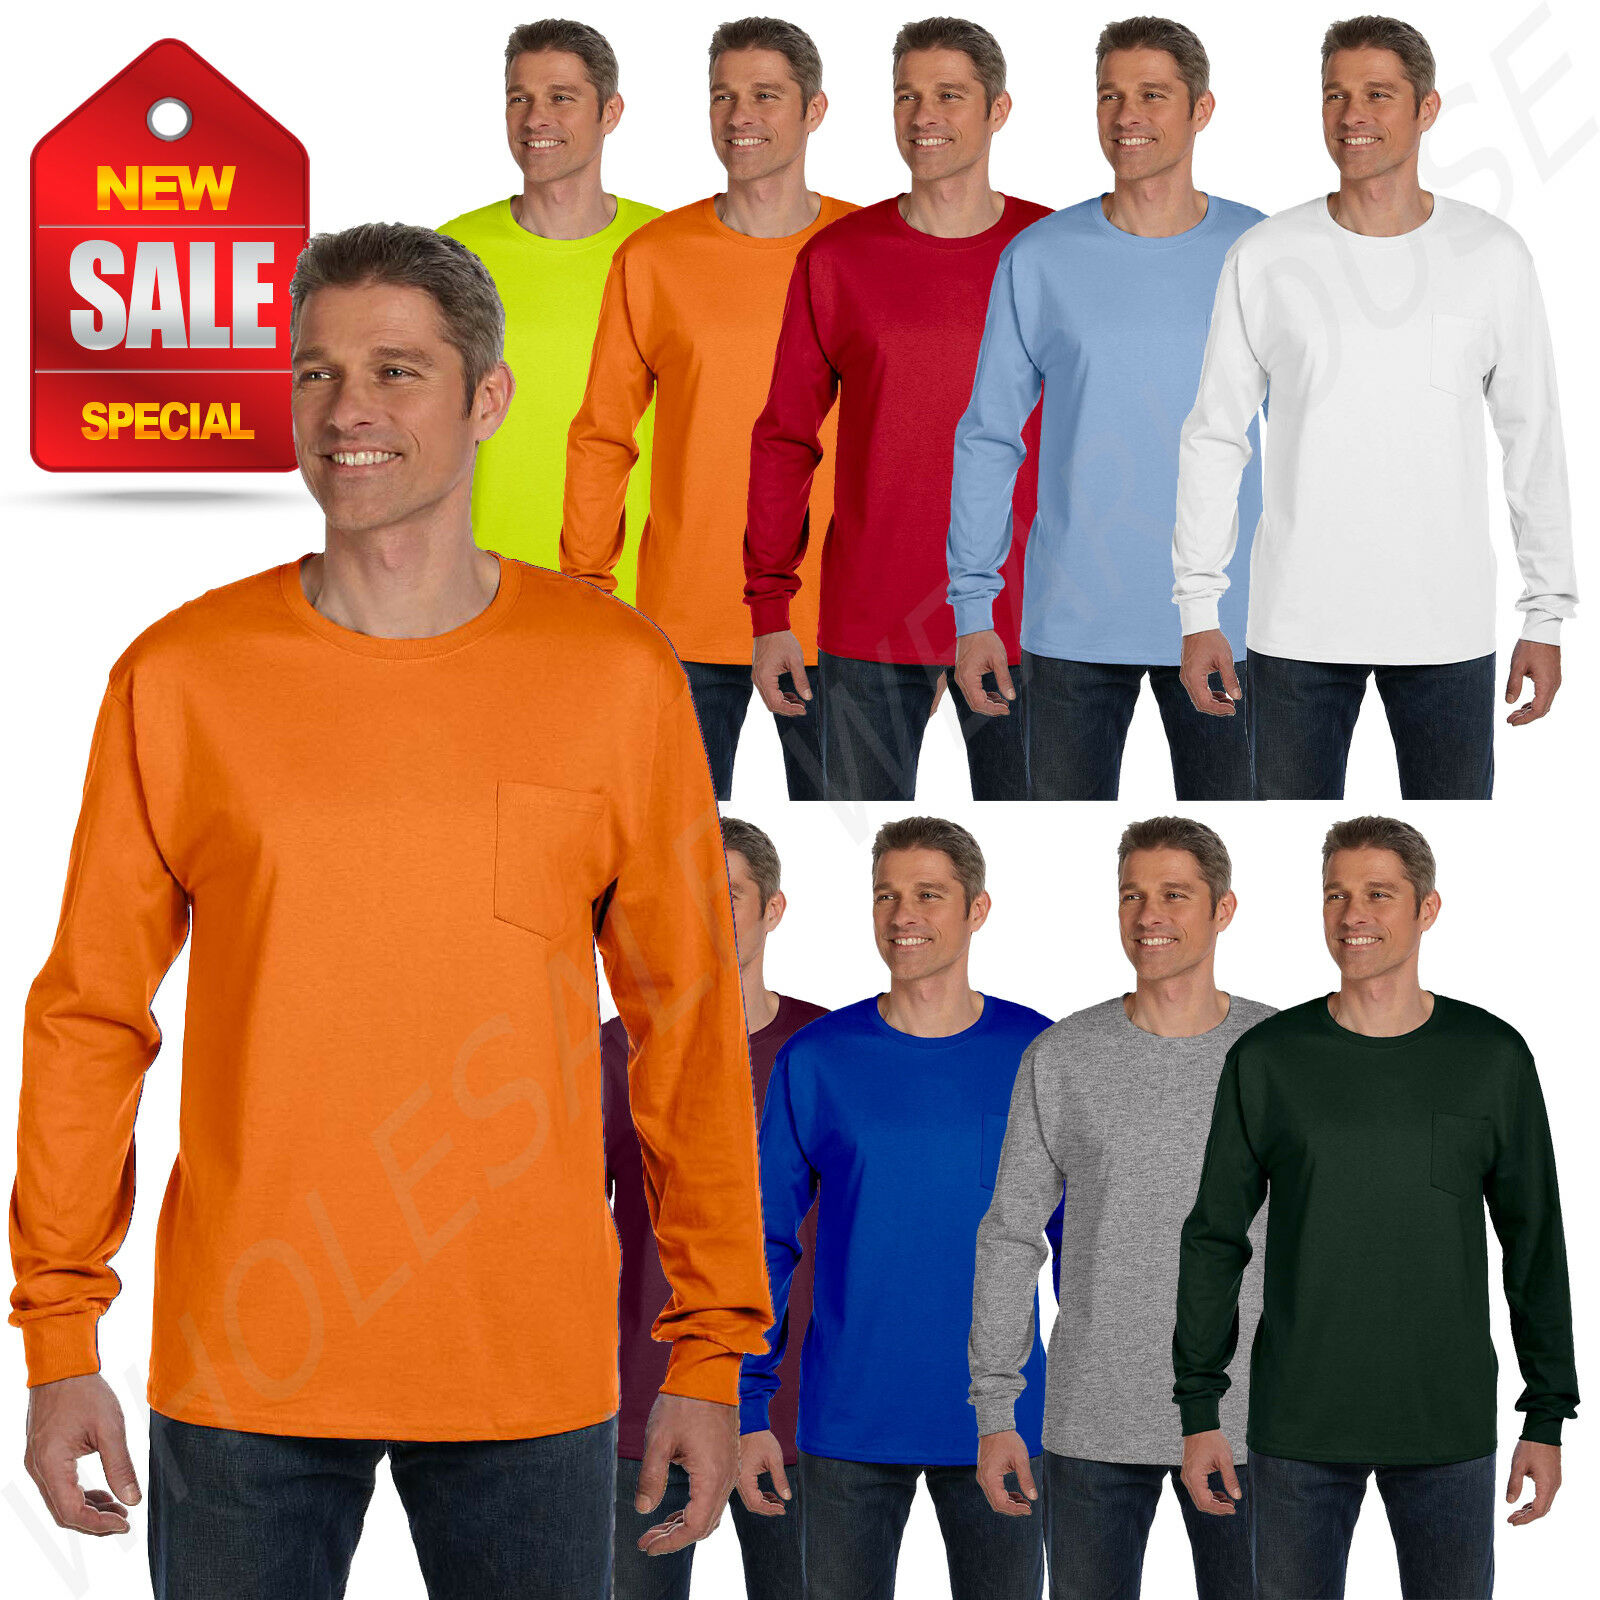 hanes-mens-long-sleeve-pocket-t-shirt-100-cotton-6-1-oz-heavy-tagless-s-xl-5596